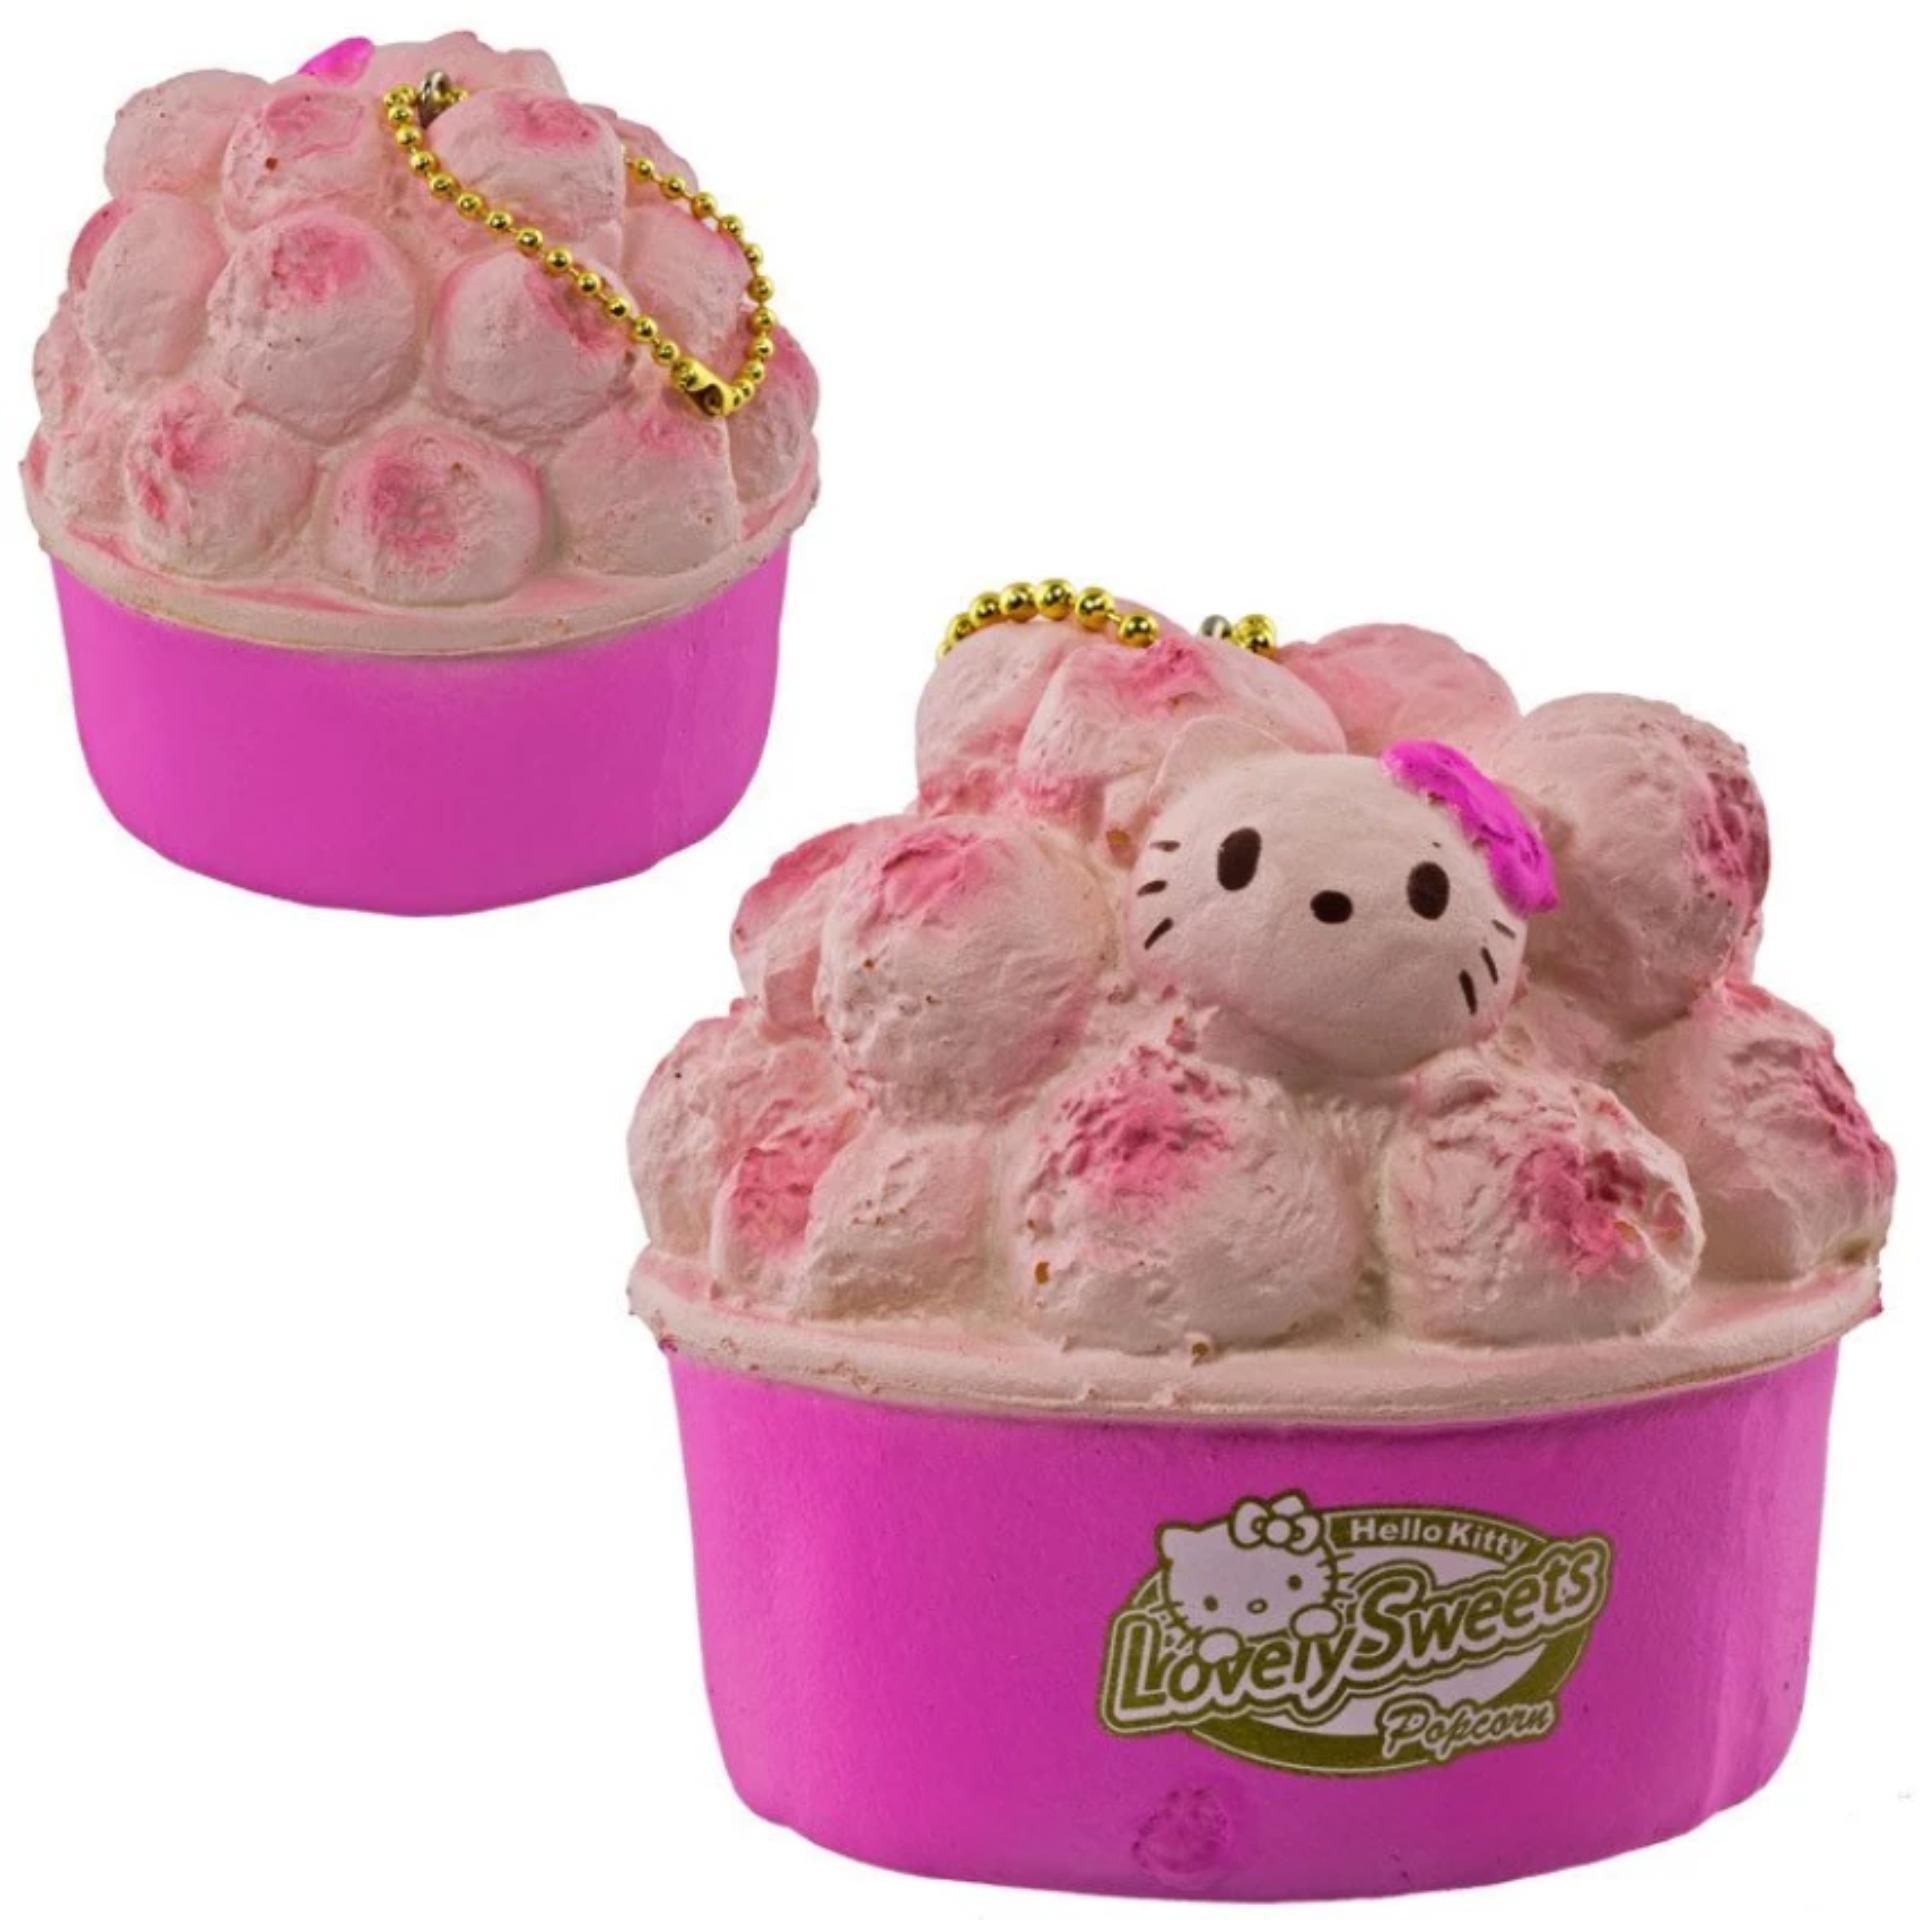 Gantungan Kunci Hello Kitty Squishy Seri Lovely Sweets - PopcornStroberi .